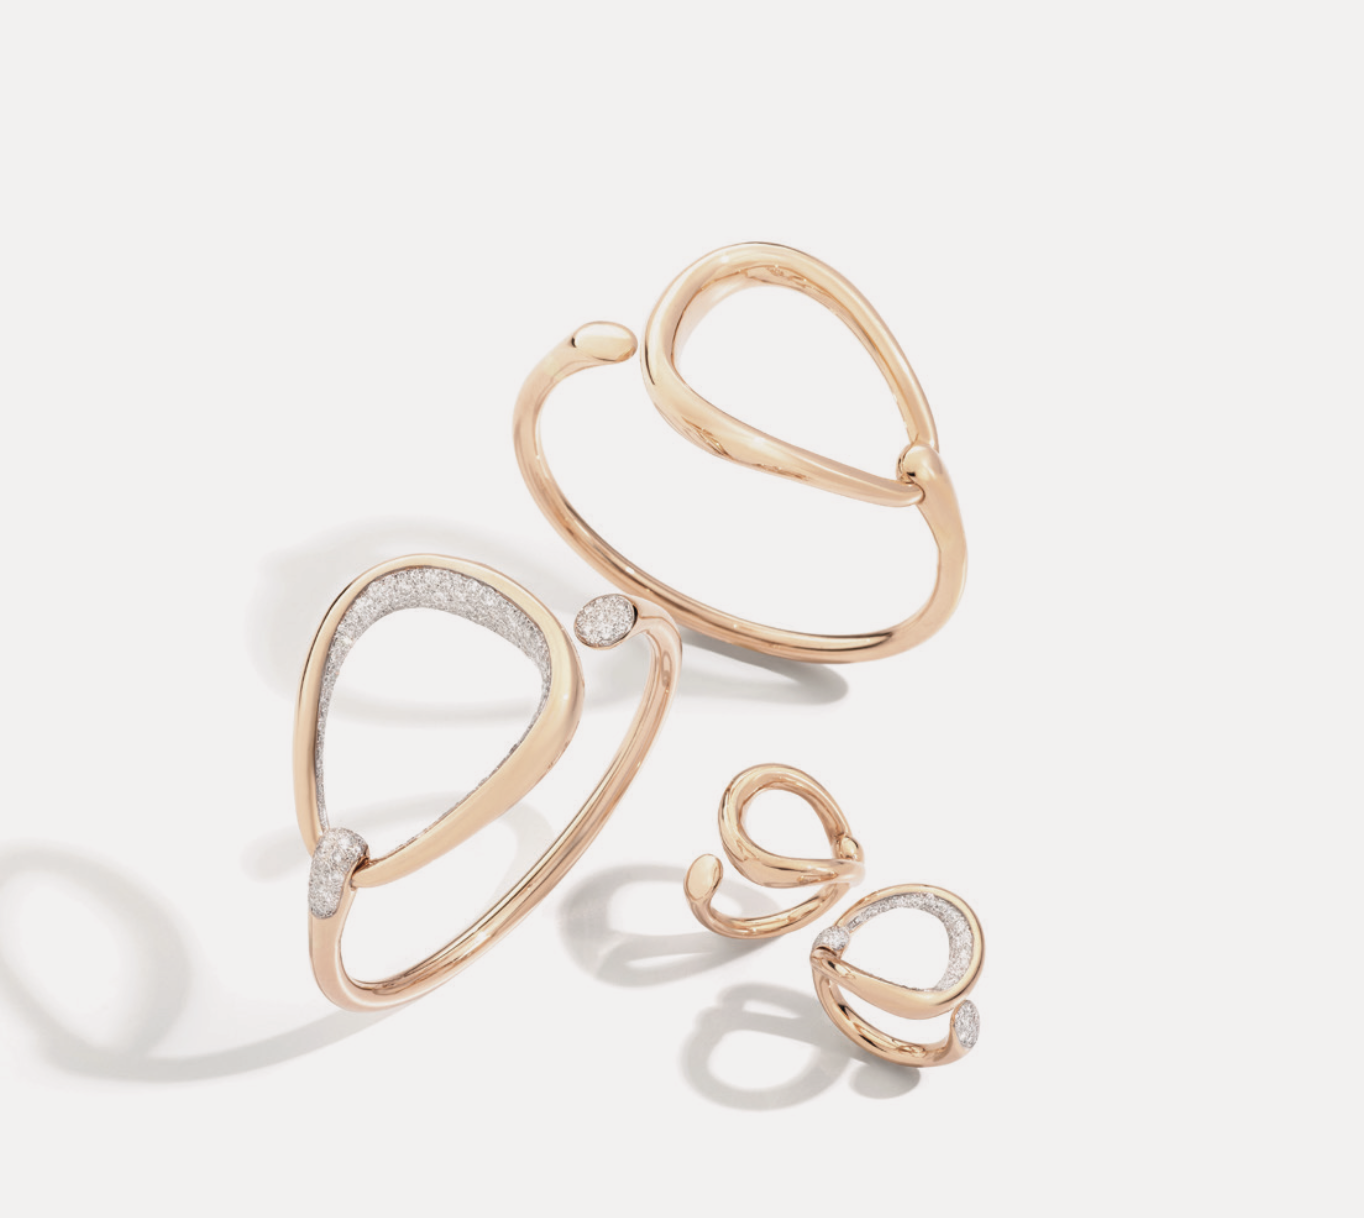 Pomellato: Armspange Fantina Roségold — Armspange Fantina Roségold mit Diamanten — Ring Fantina Roségold — Ring Fantina mit Diamanten ©Pomellato